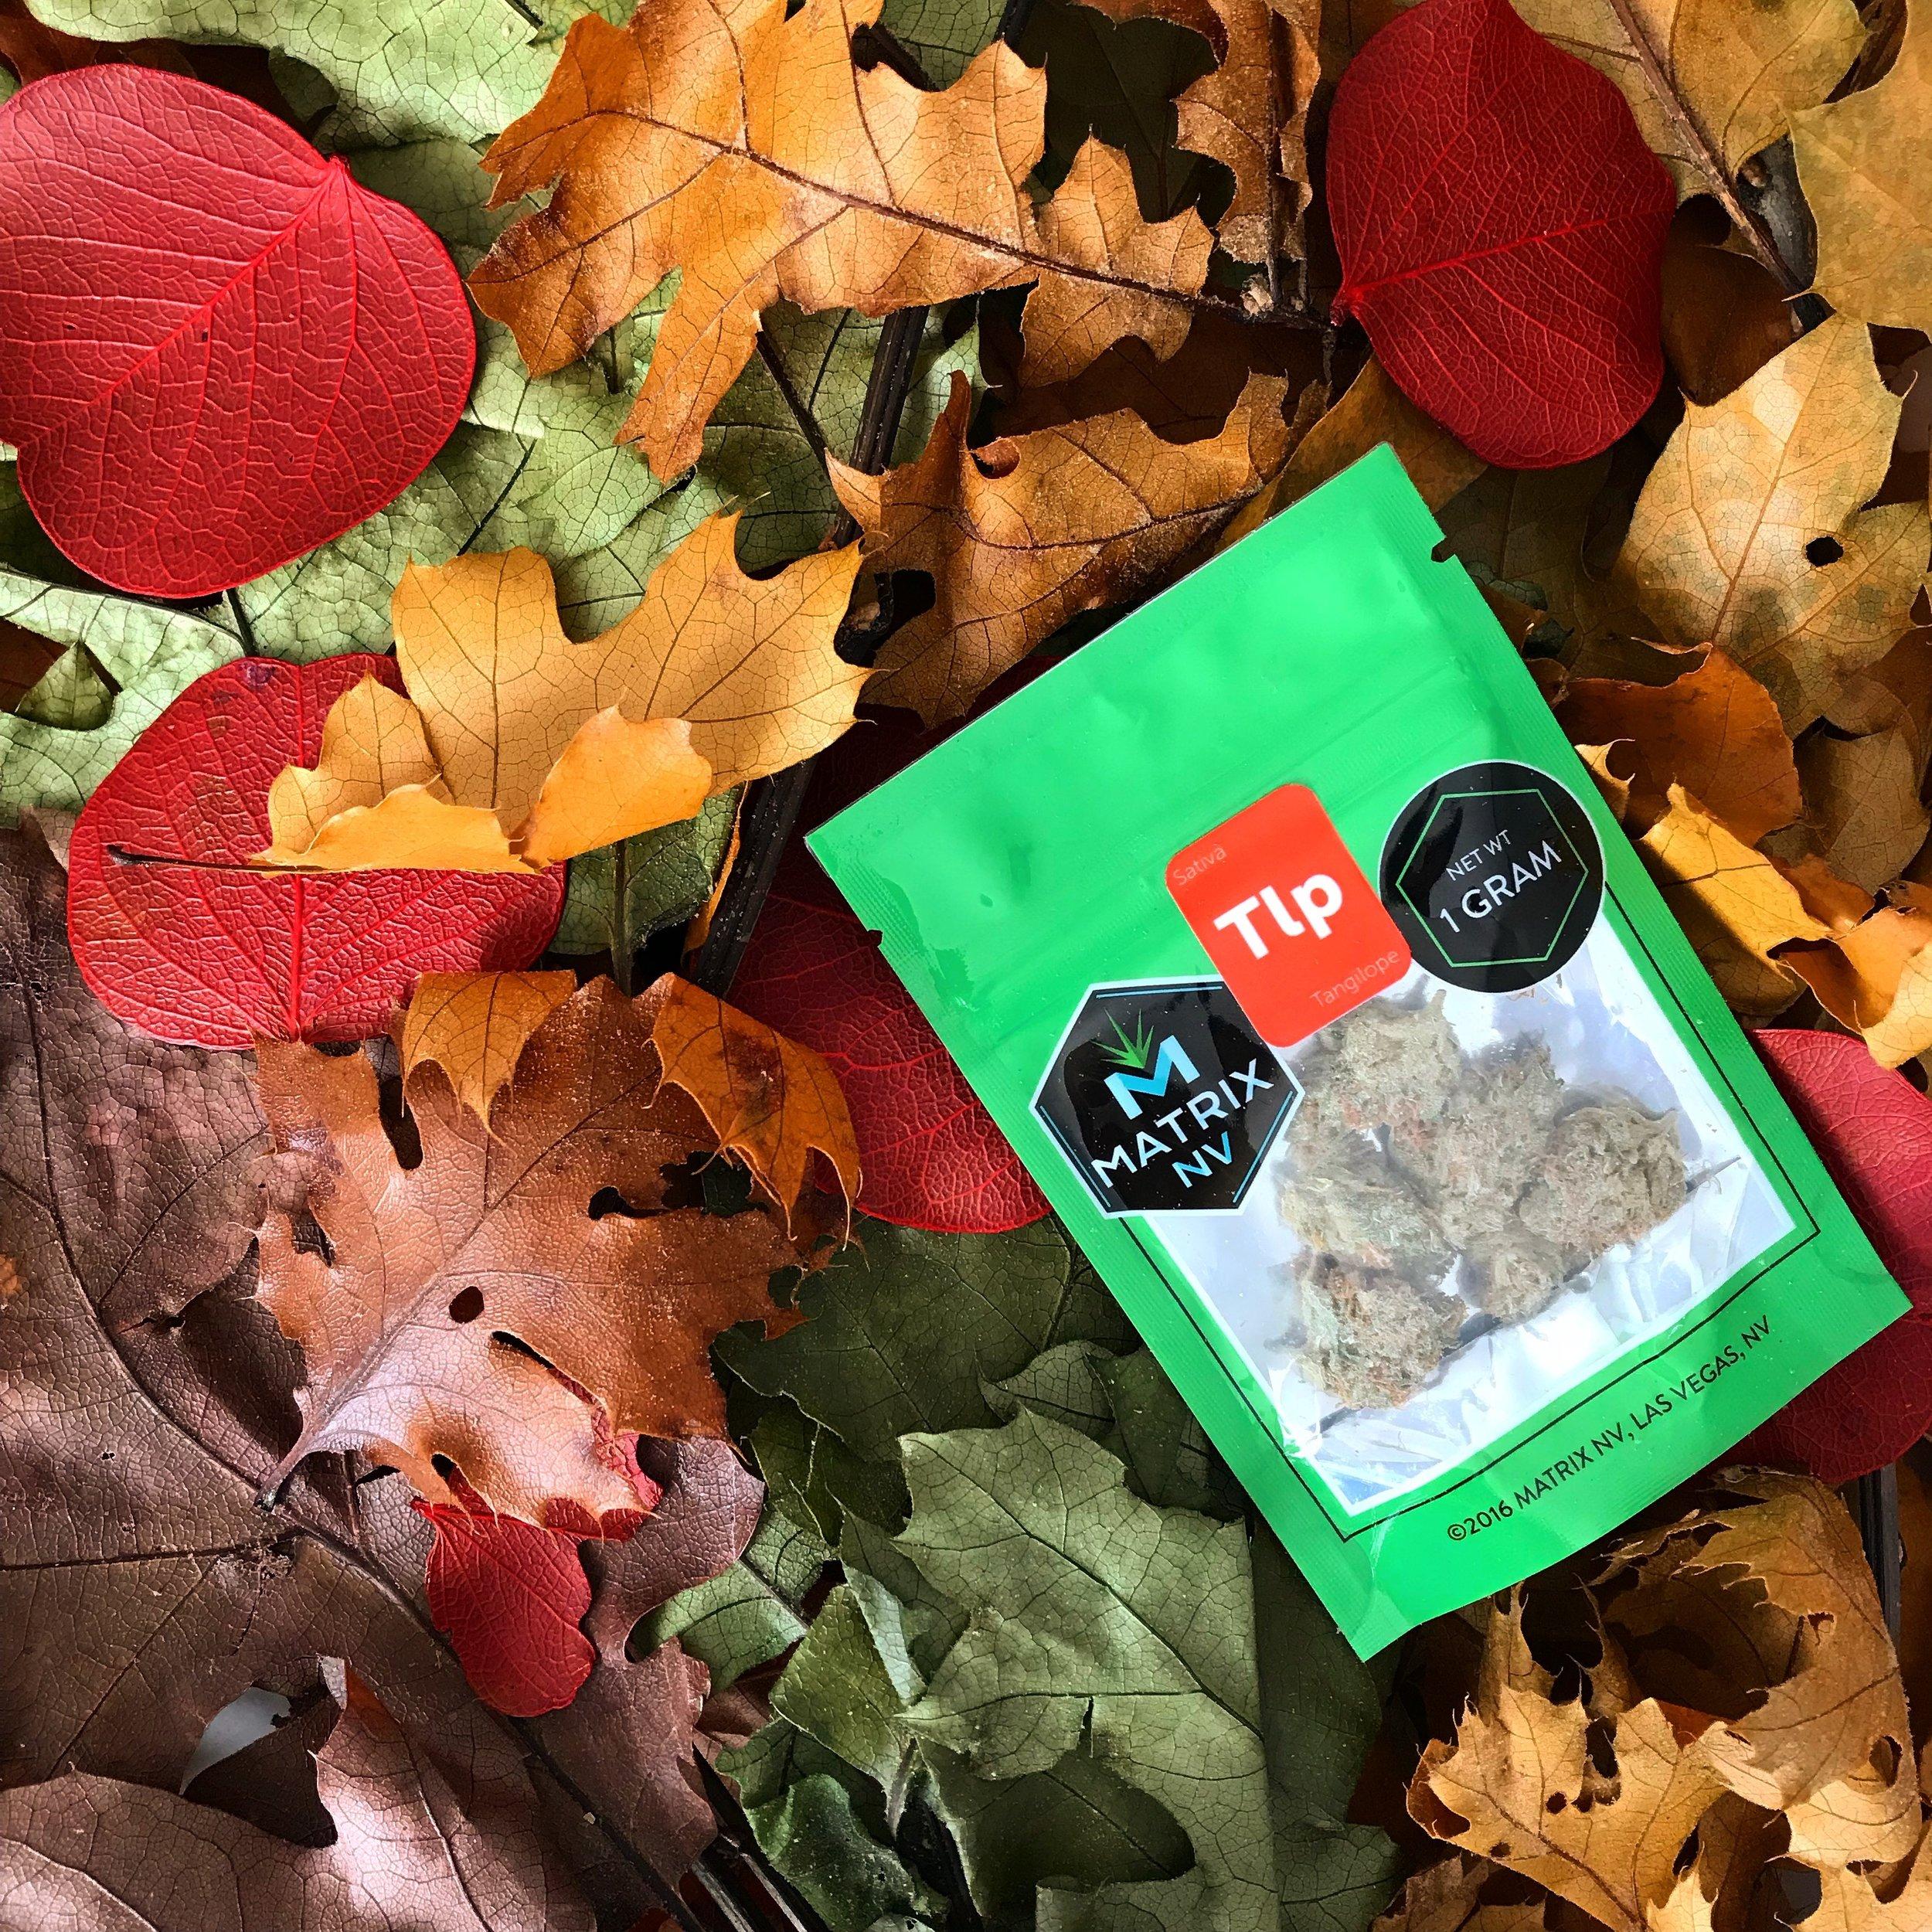 Matrix NV -  @matrix_nv  Social Feature - @cannabisinvegas  The+Source -  @thesourcenevada